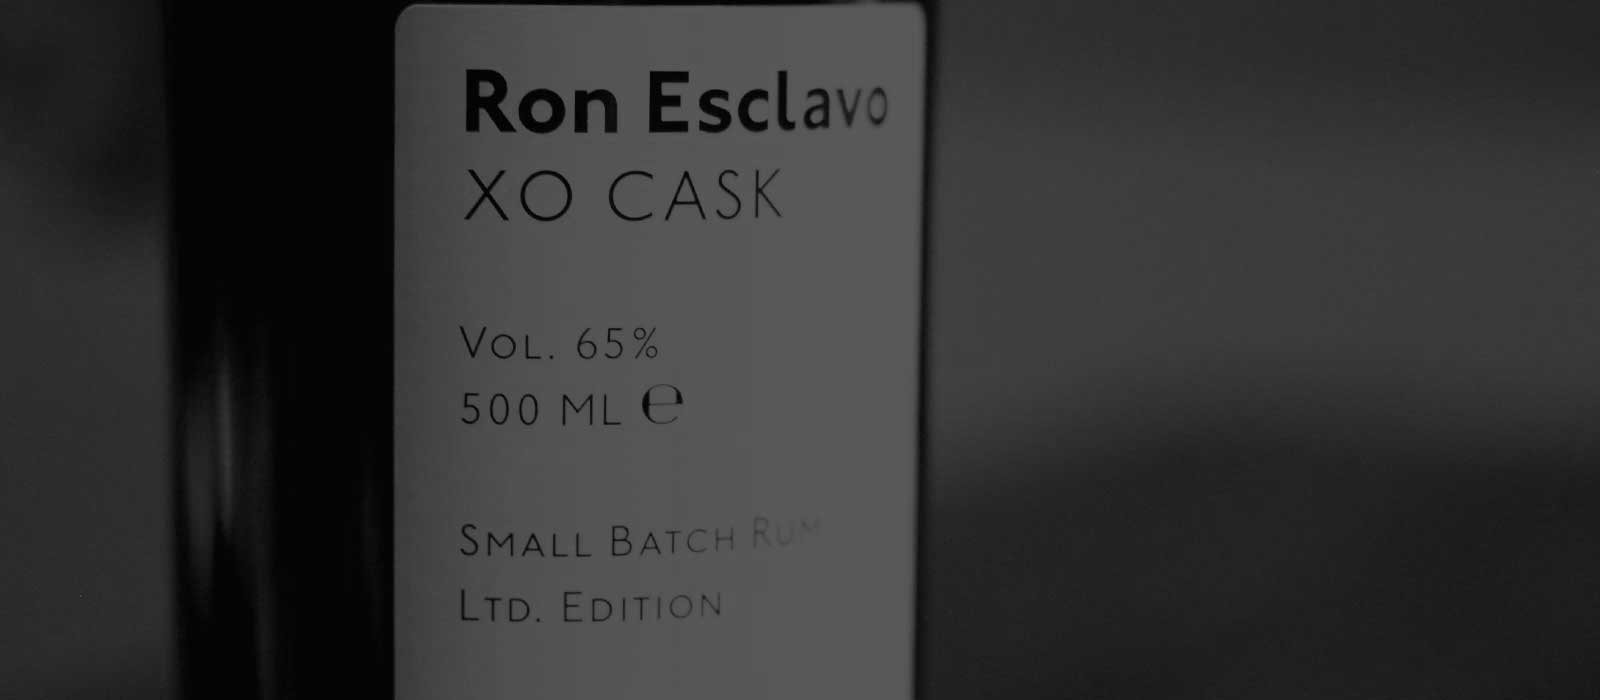 Månadens rom februari 2018: Ron Esclavo XO Cask